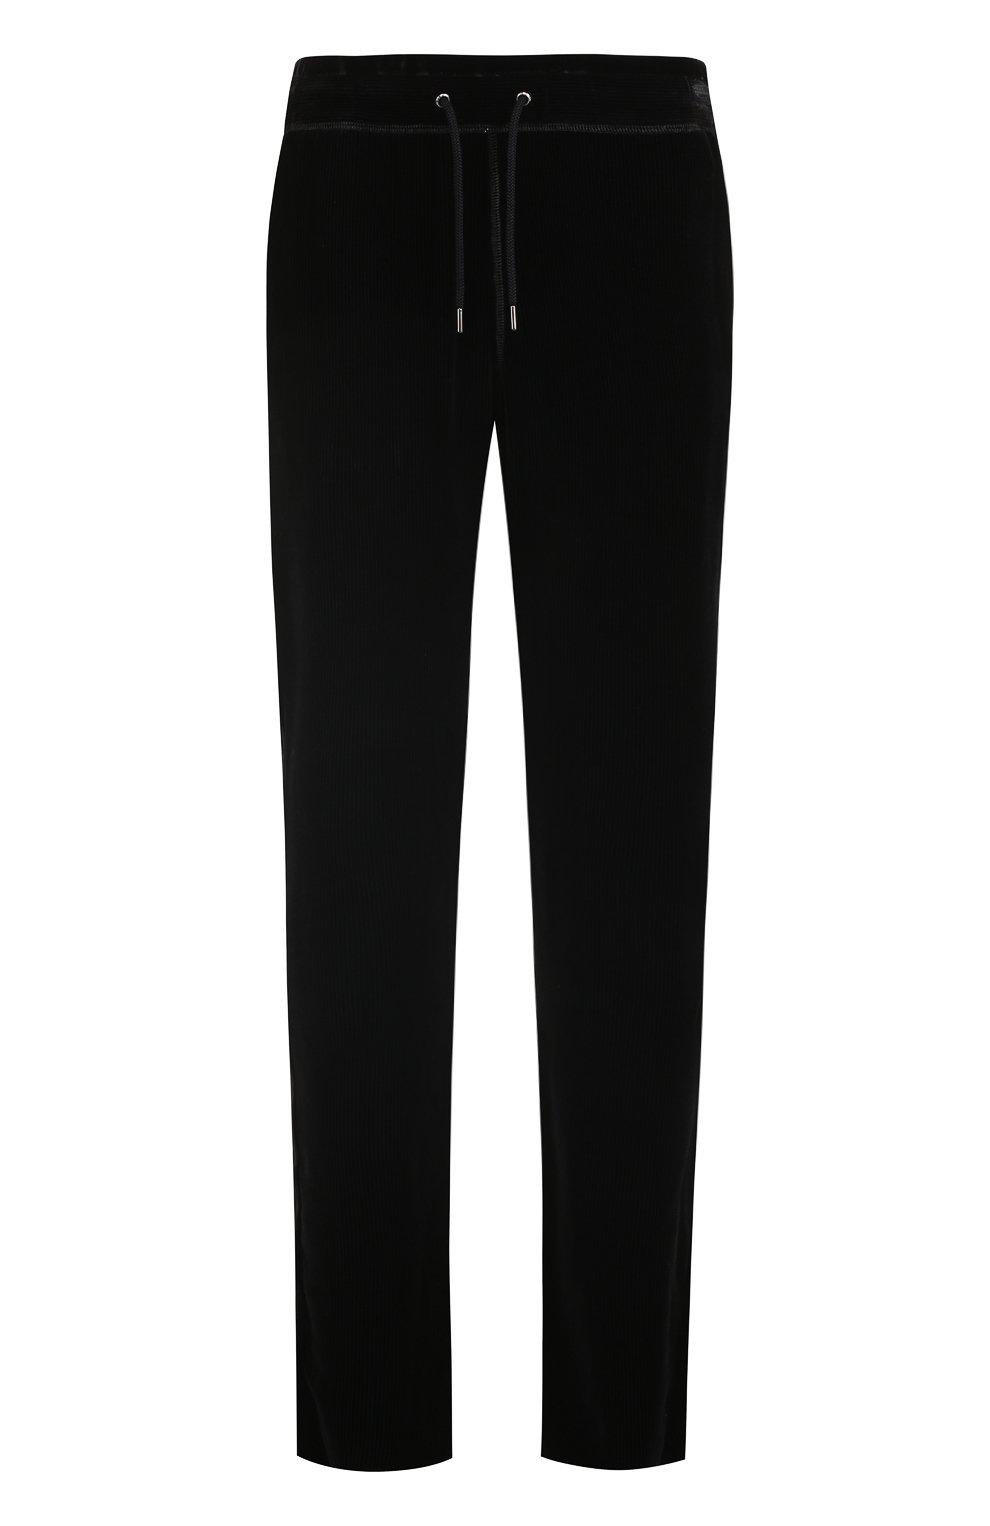 2825e10e2ce Мужские черные брюки из смеси вискозы и шелка GIORGIO ARMANI ...